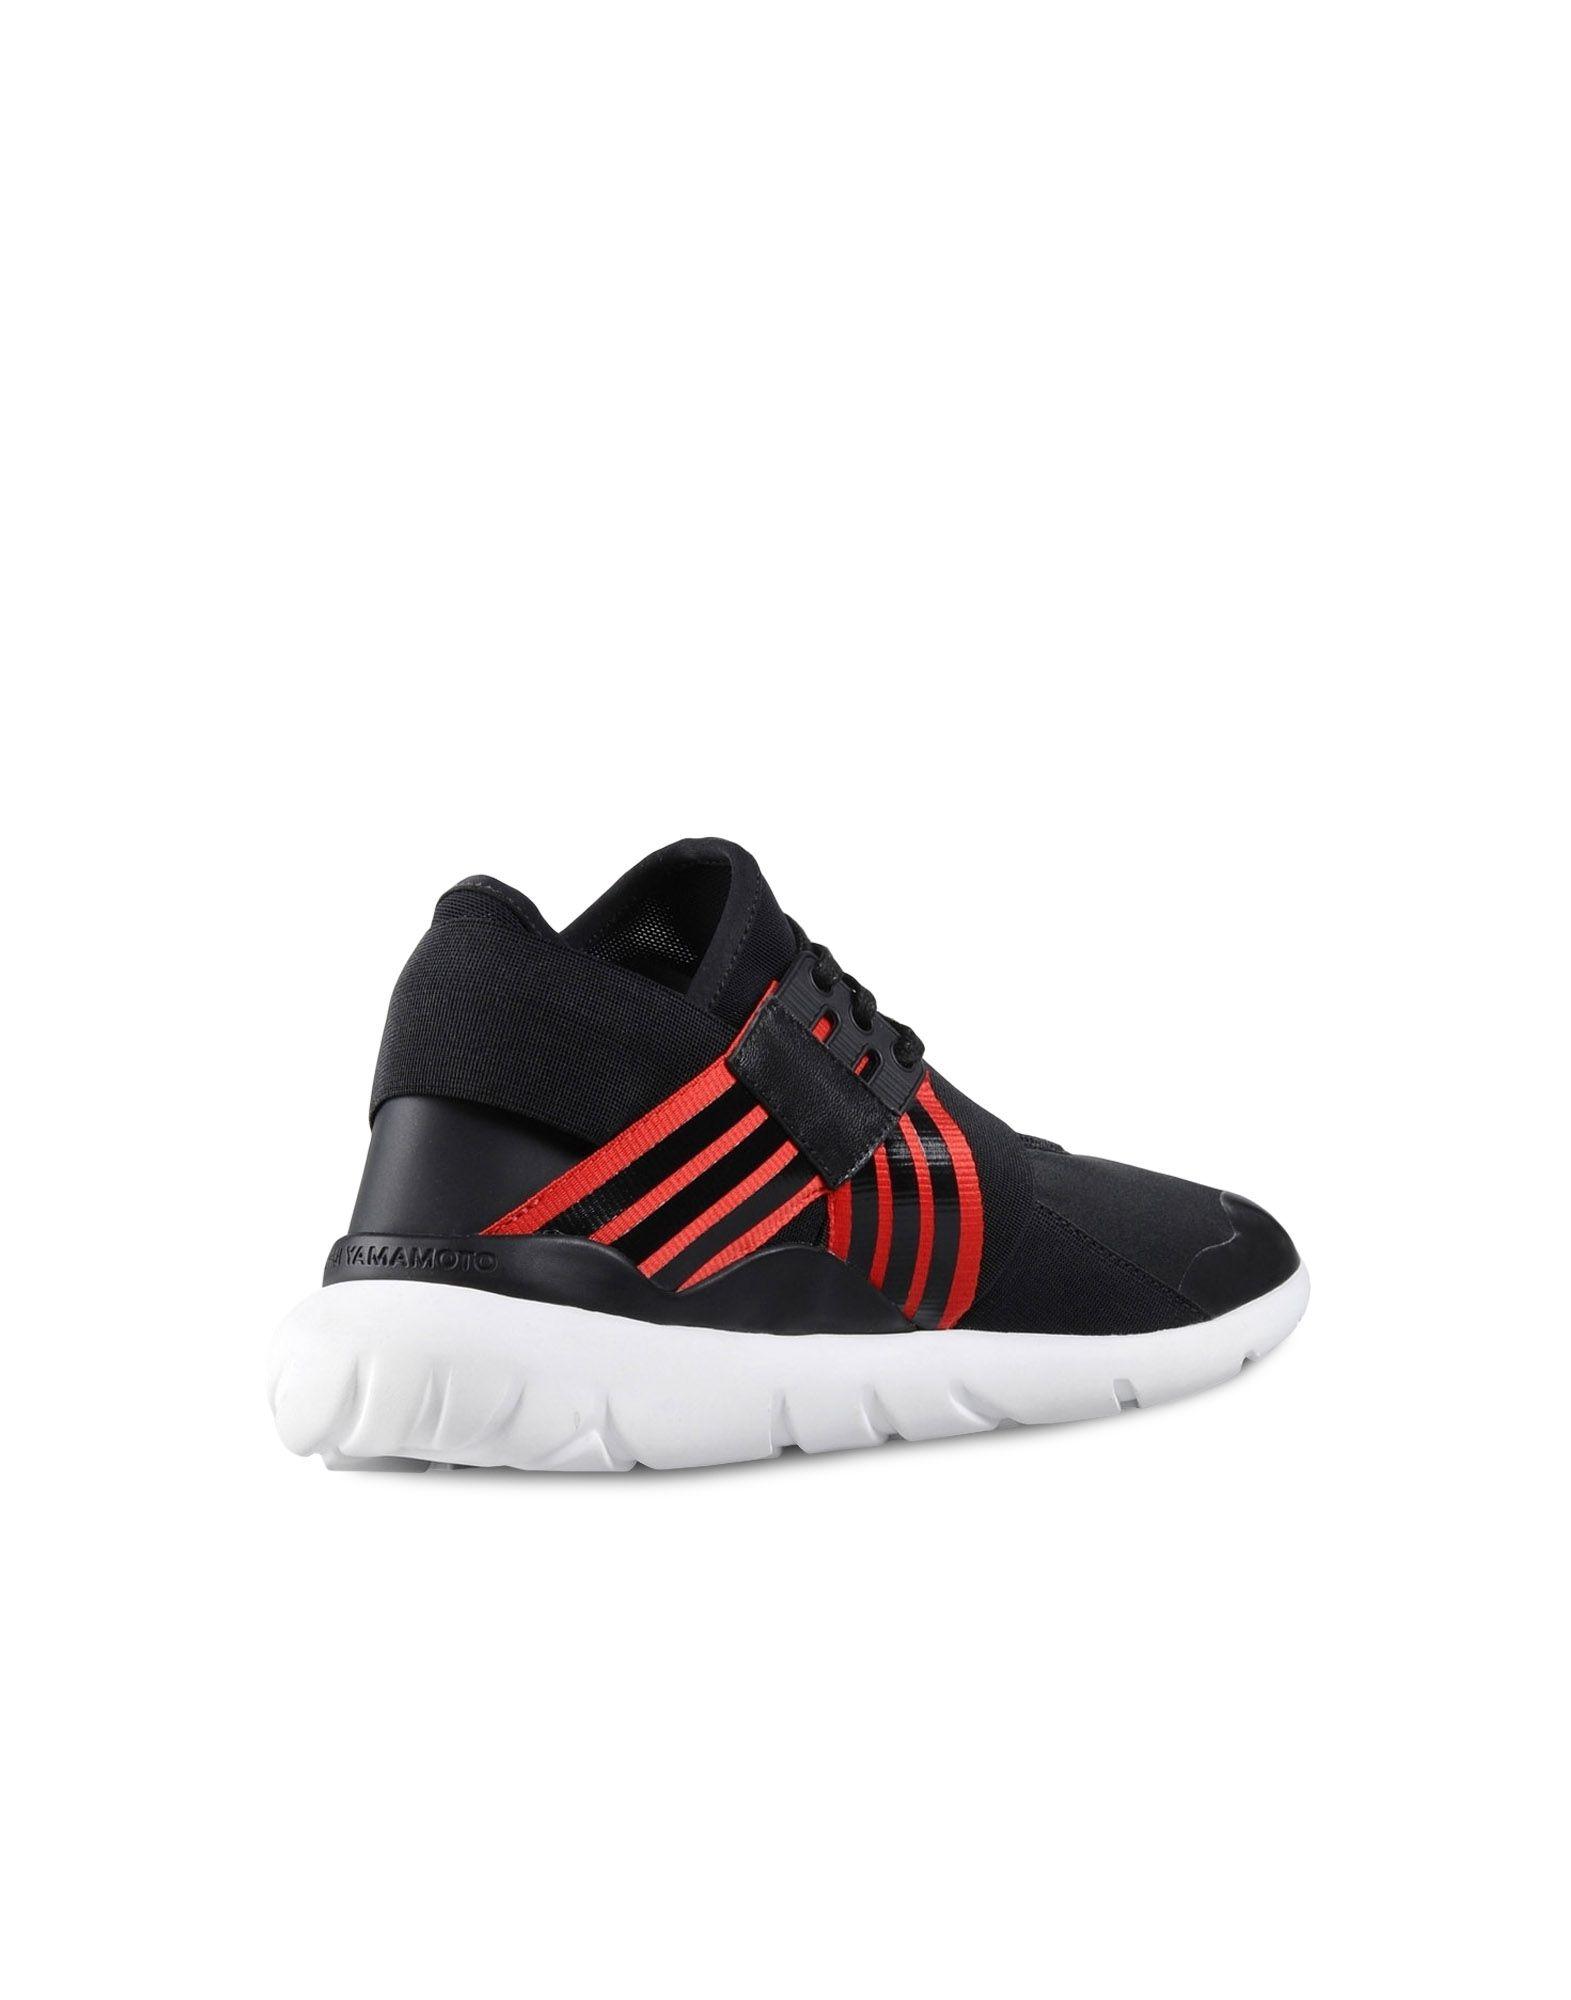 202759f7a5a2d ... Y-3 Y-3 QASA ELLE LACE Sneakers Woman ...